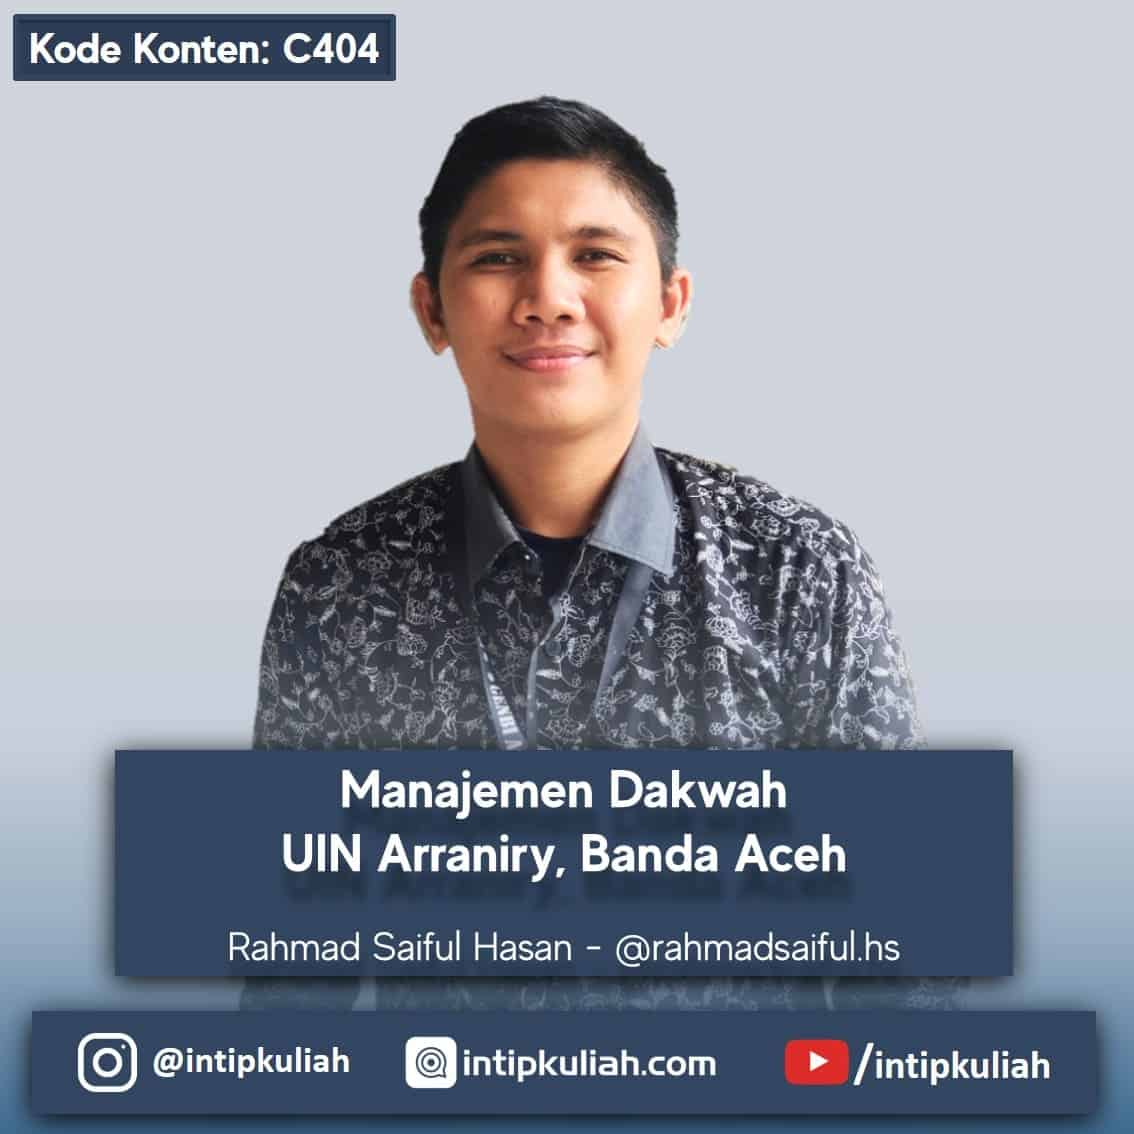 Manajemen Dakwah UIN Arraniry (Rahmad)